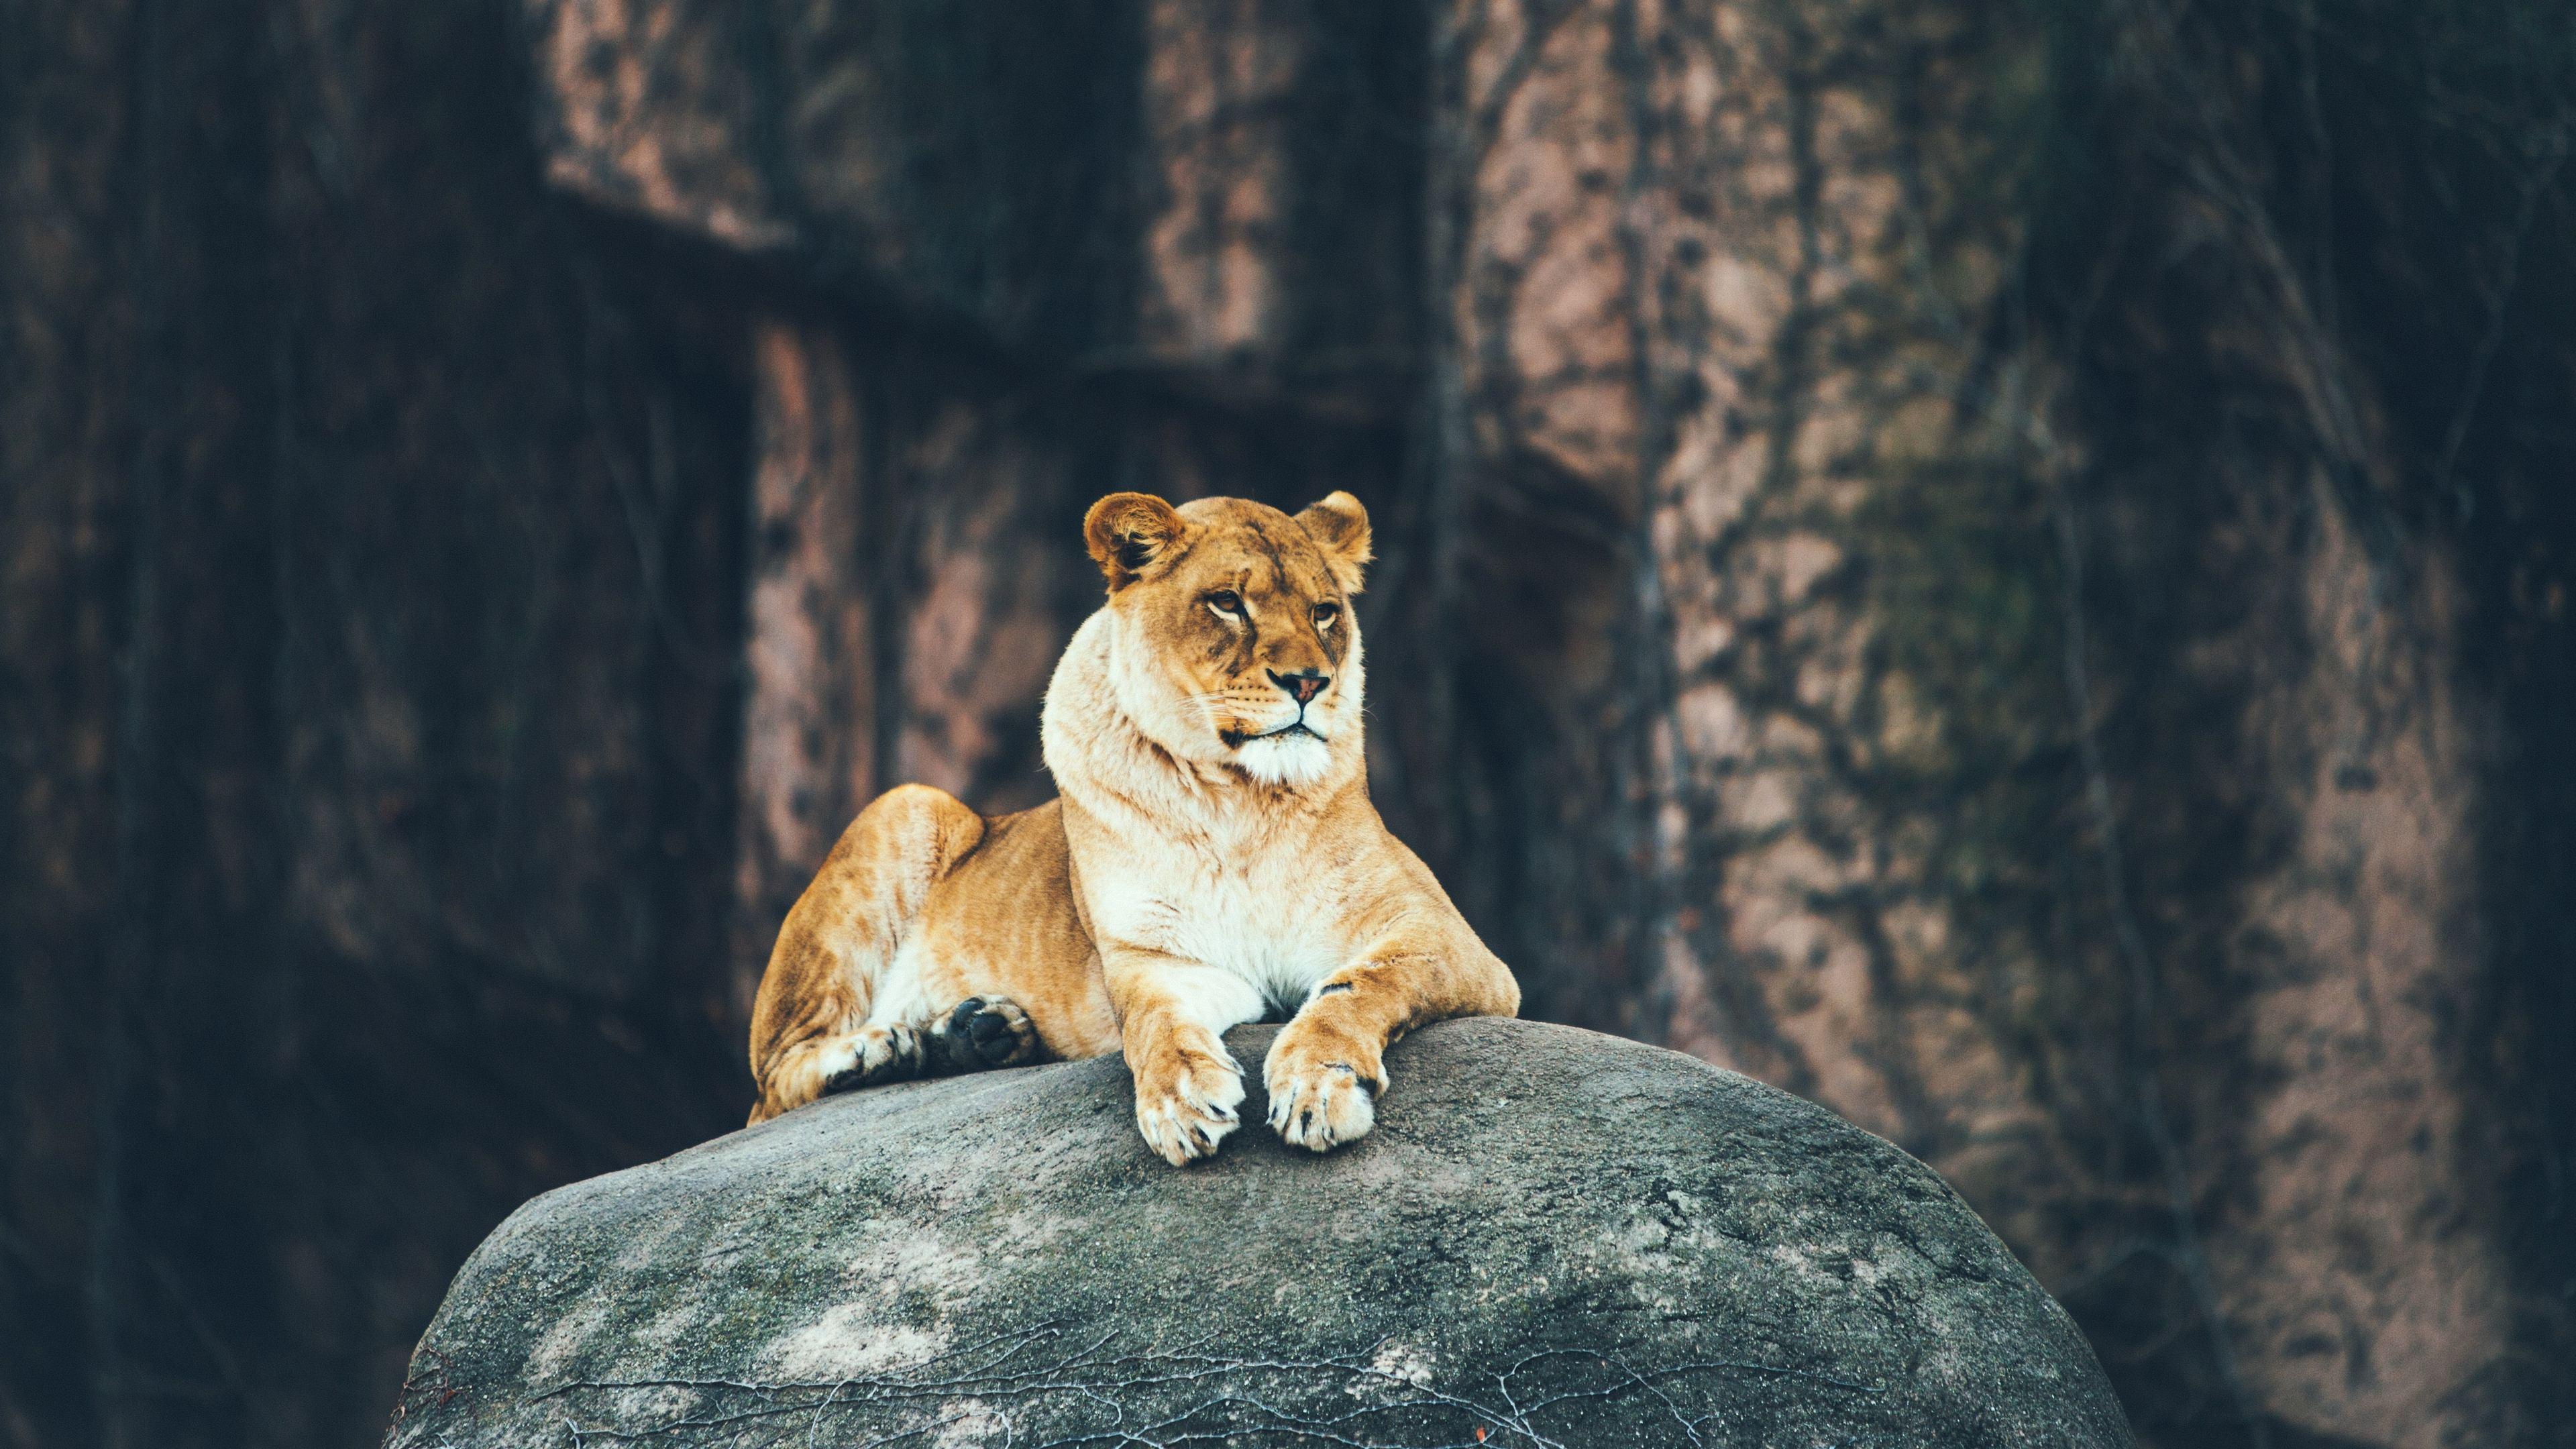 lion sitting on rock 4k 1542239647 - Lion Sitting On Rock 4k - lioness wallpapers, lion wallpapers, hd-wallpapers, animals wallpapers, 4k-wallpapers